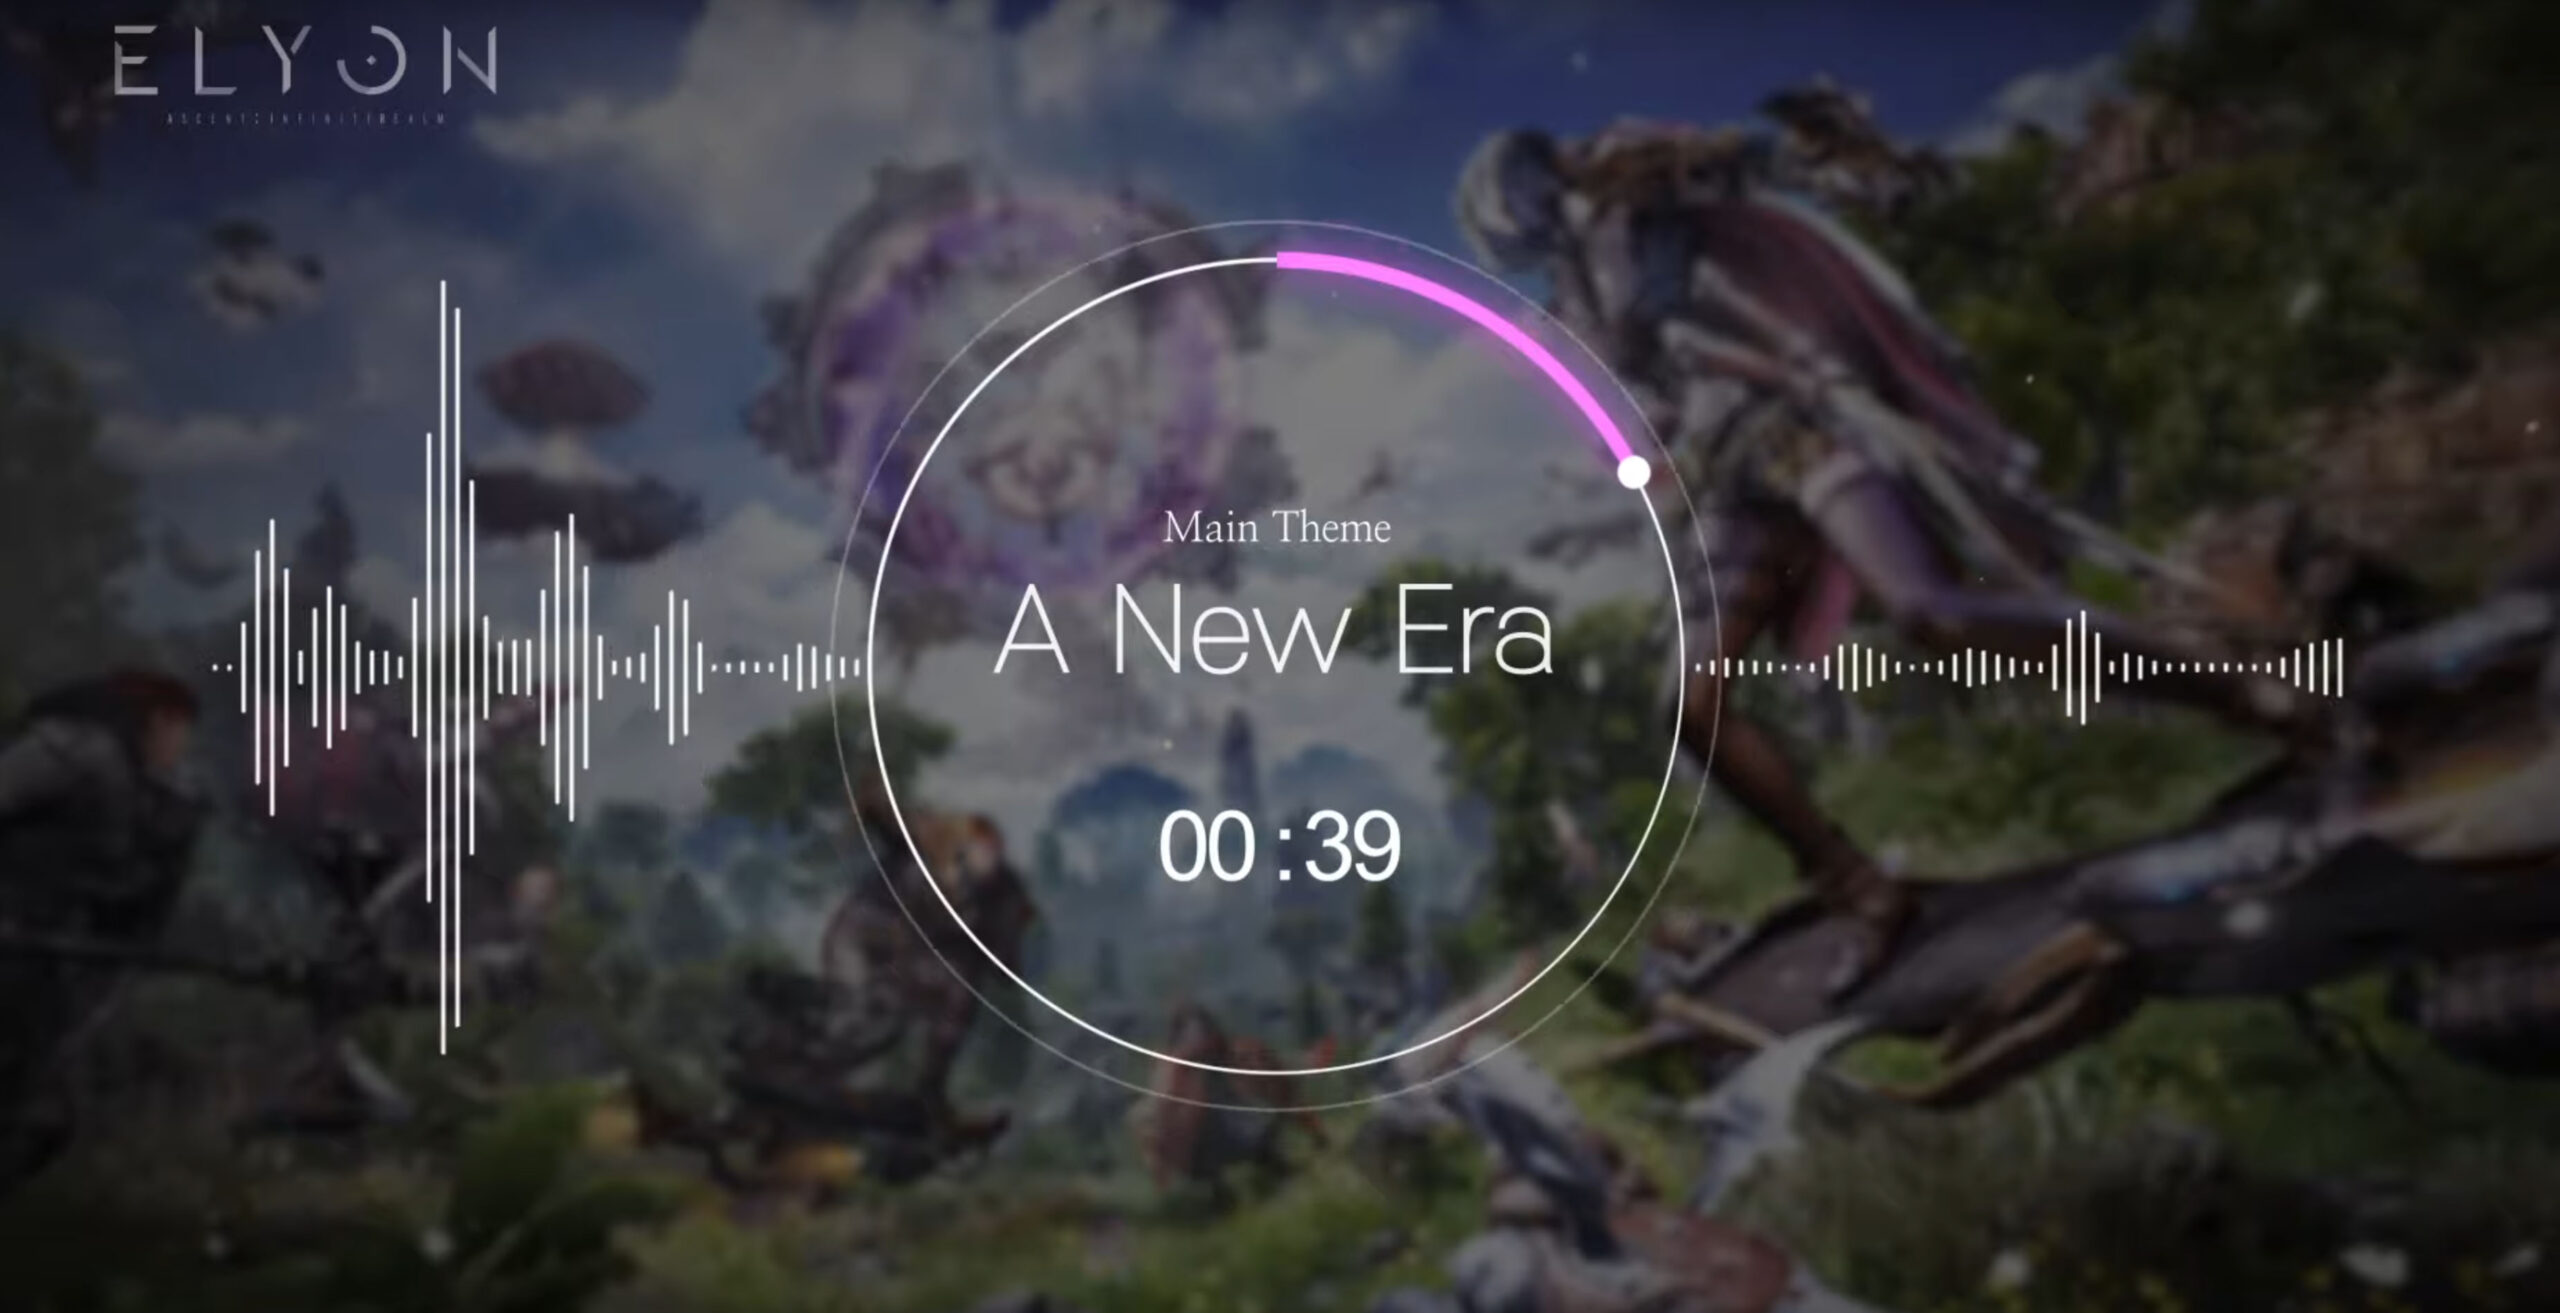 Elyon Shares Its Original Soundtrack